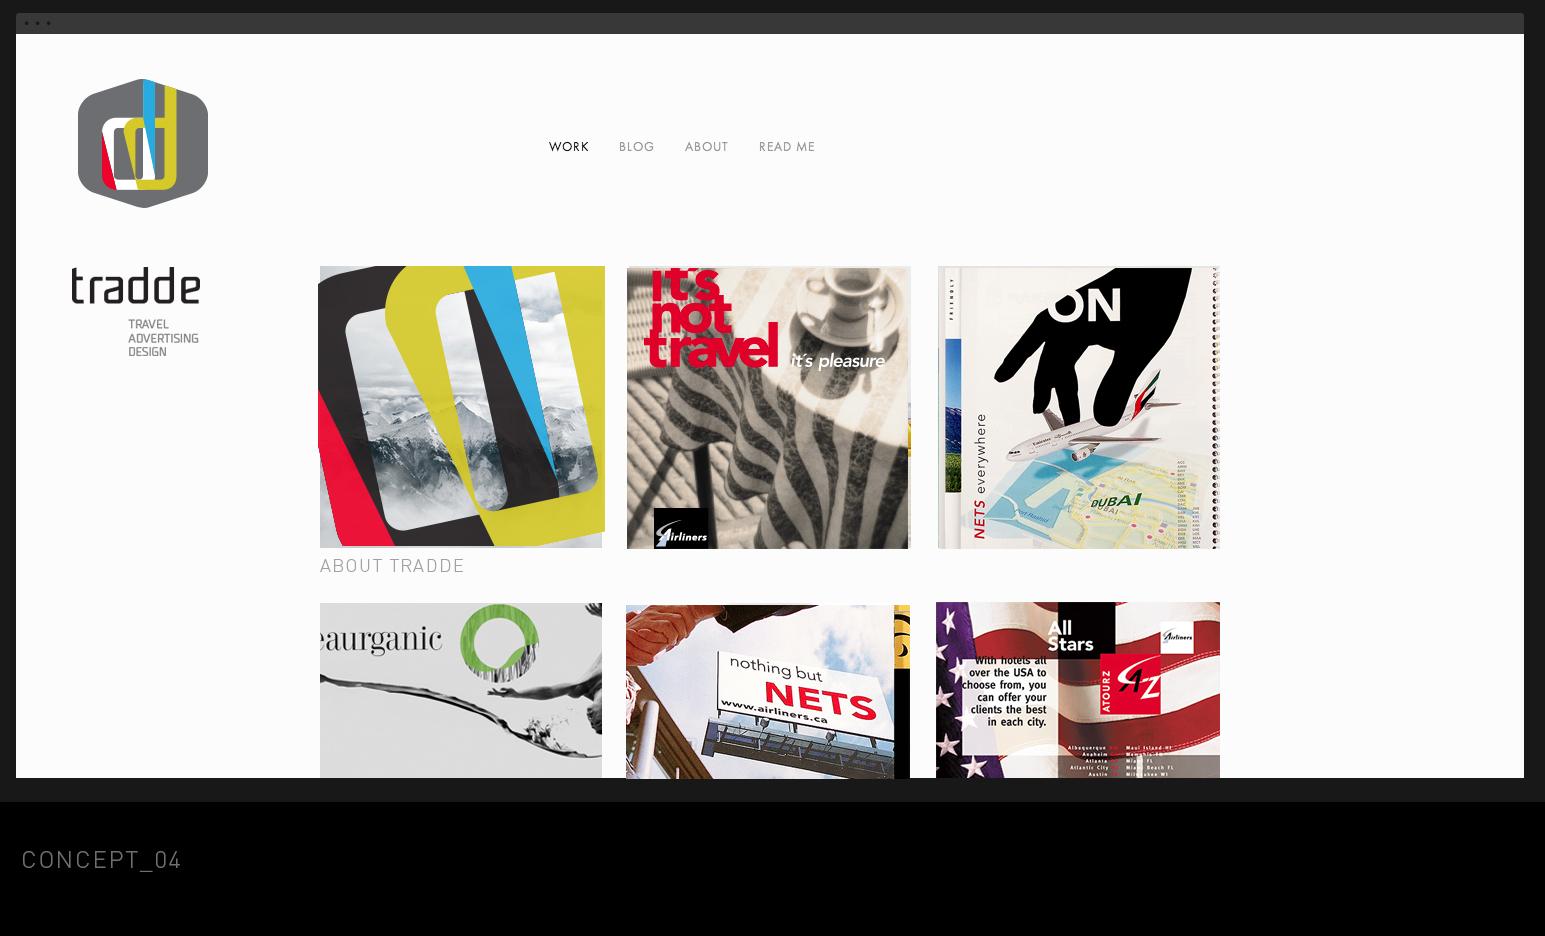 tradde_web concept_04.jpg